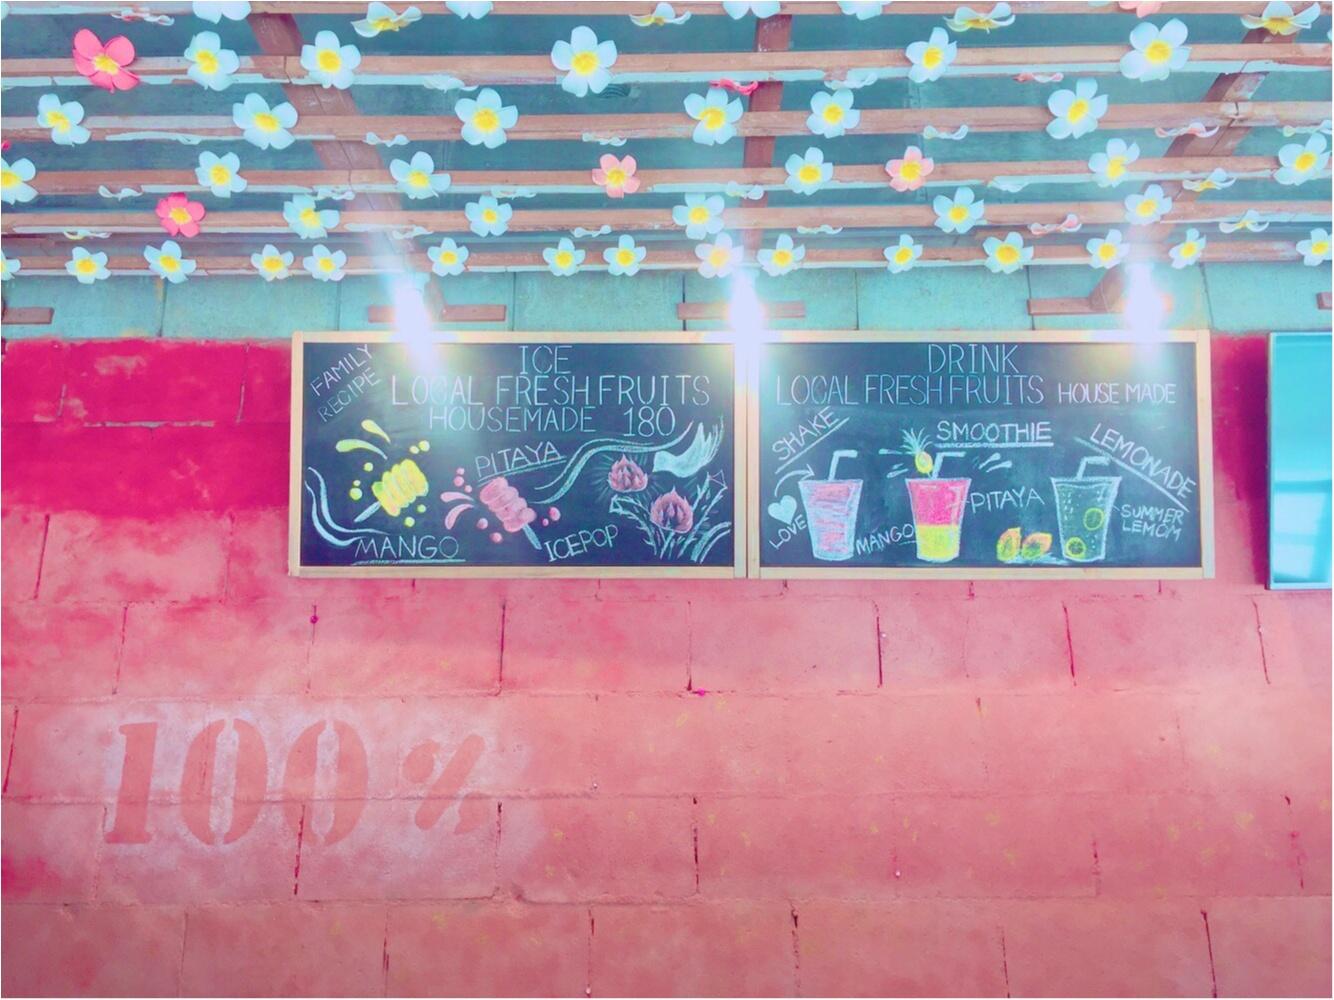 【TRIP】ほんとうは教えたくない!超フォトジェニック♡沖縄で1番すきなカフェ♡ MAGENTA n blue ♡_7